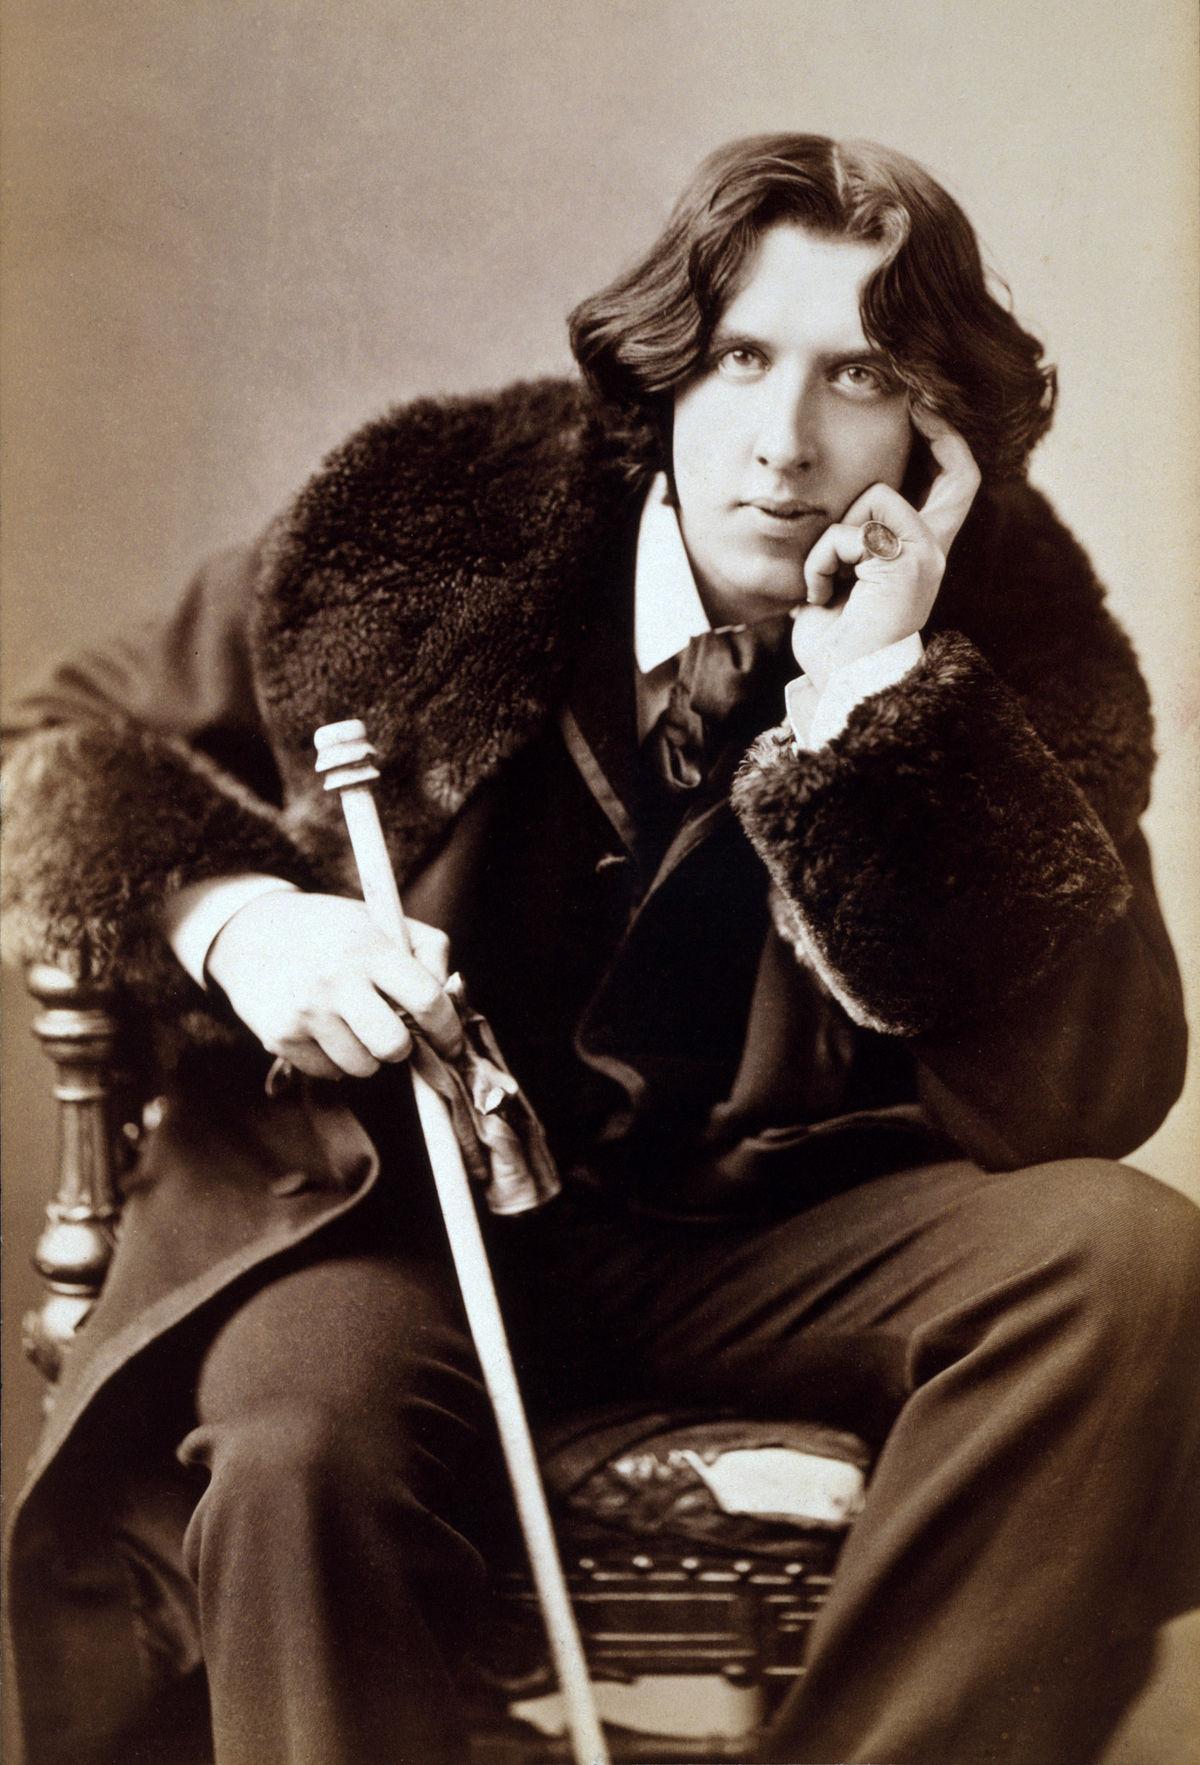 Wilde for the mummified dick